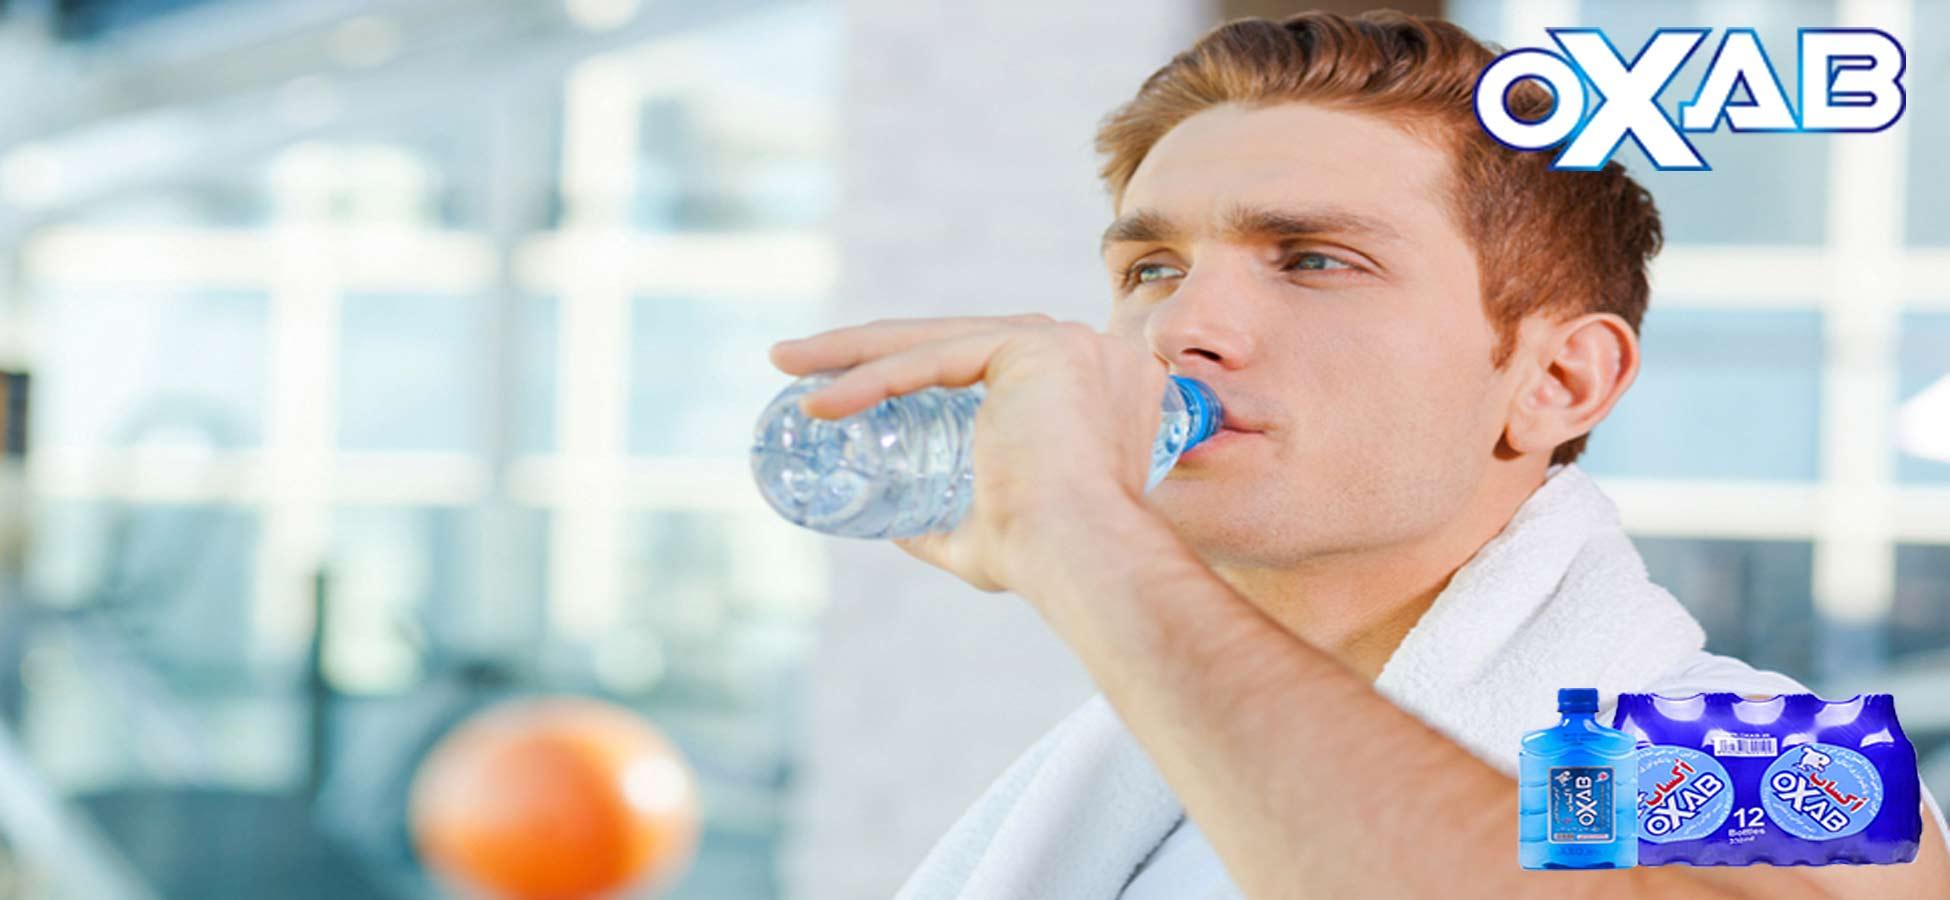 اهمیت نوشیدن آب آشامیدنی